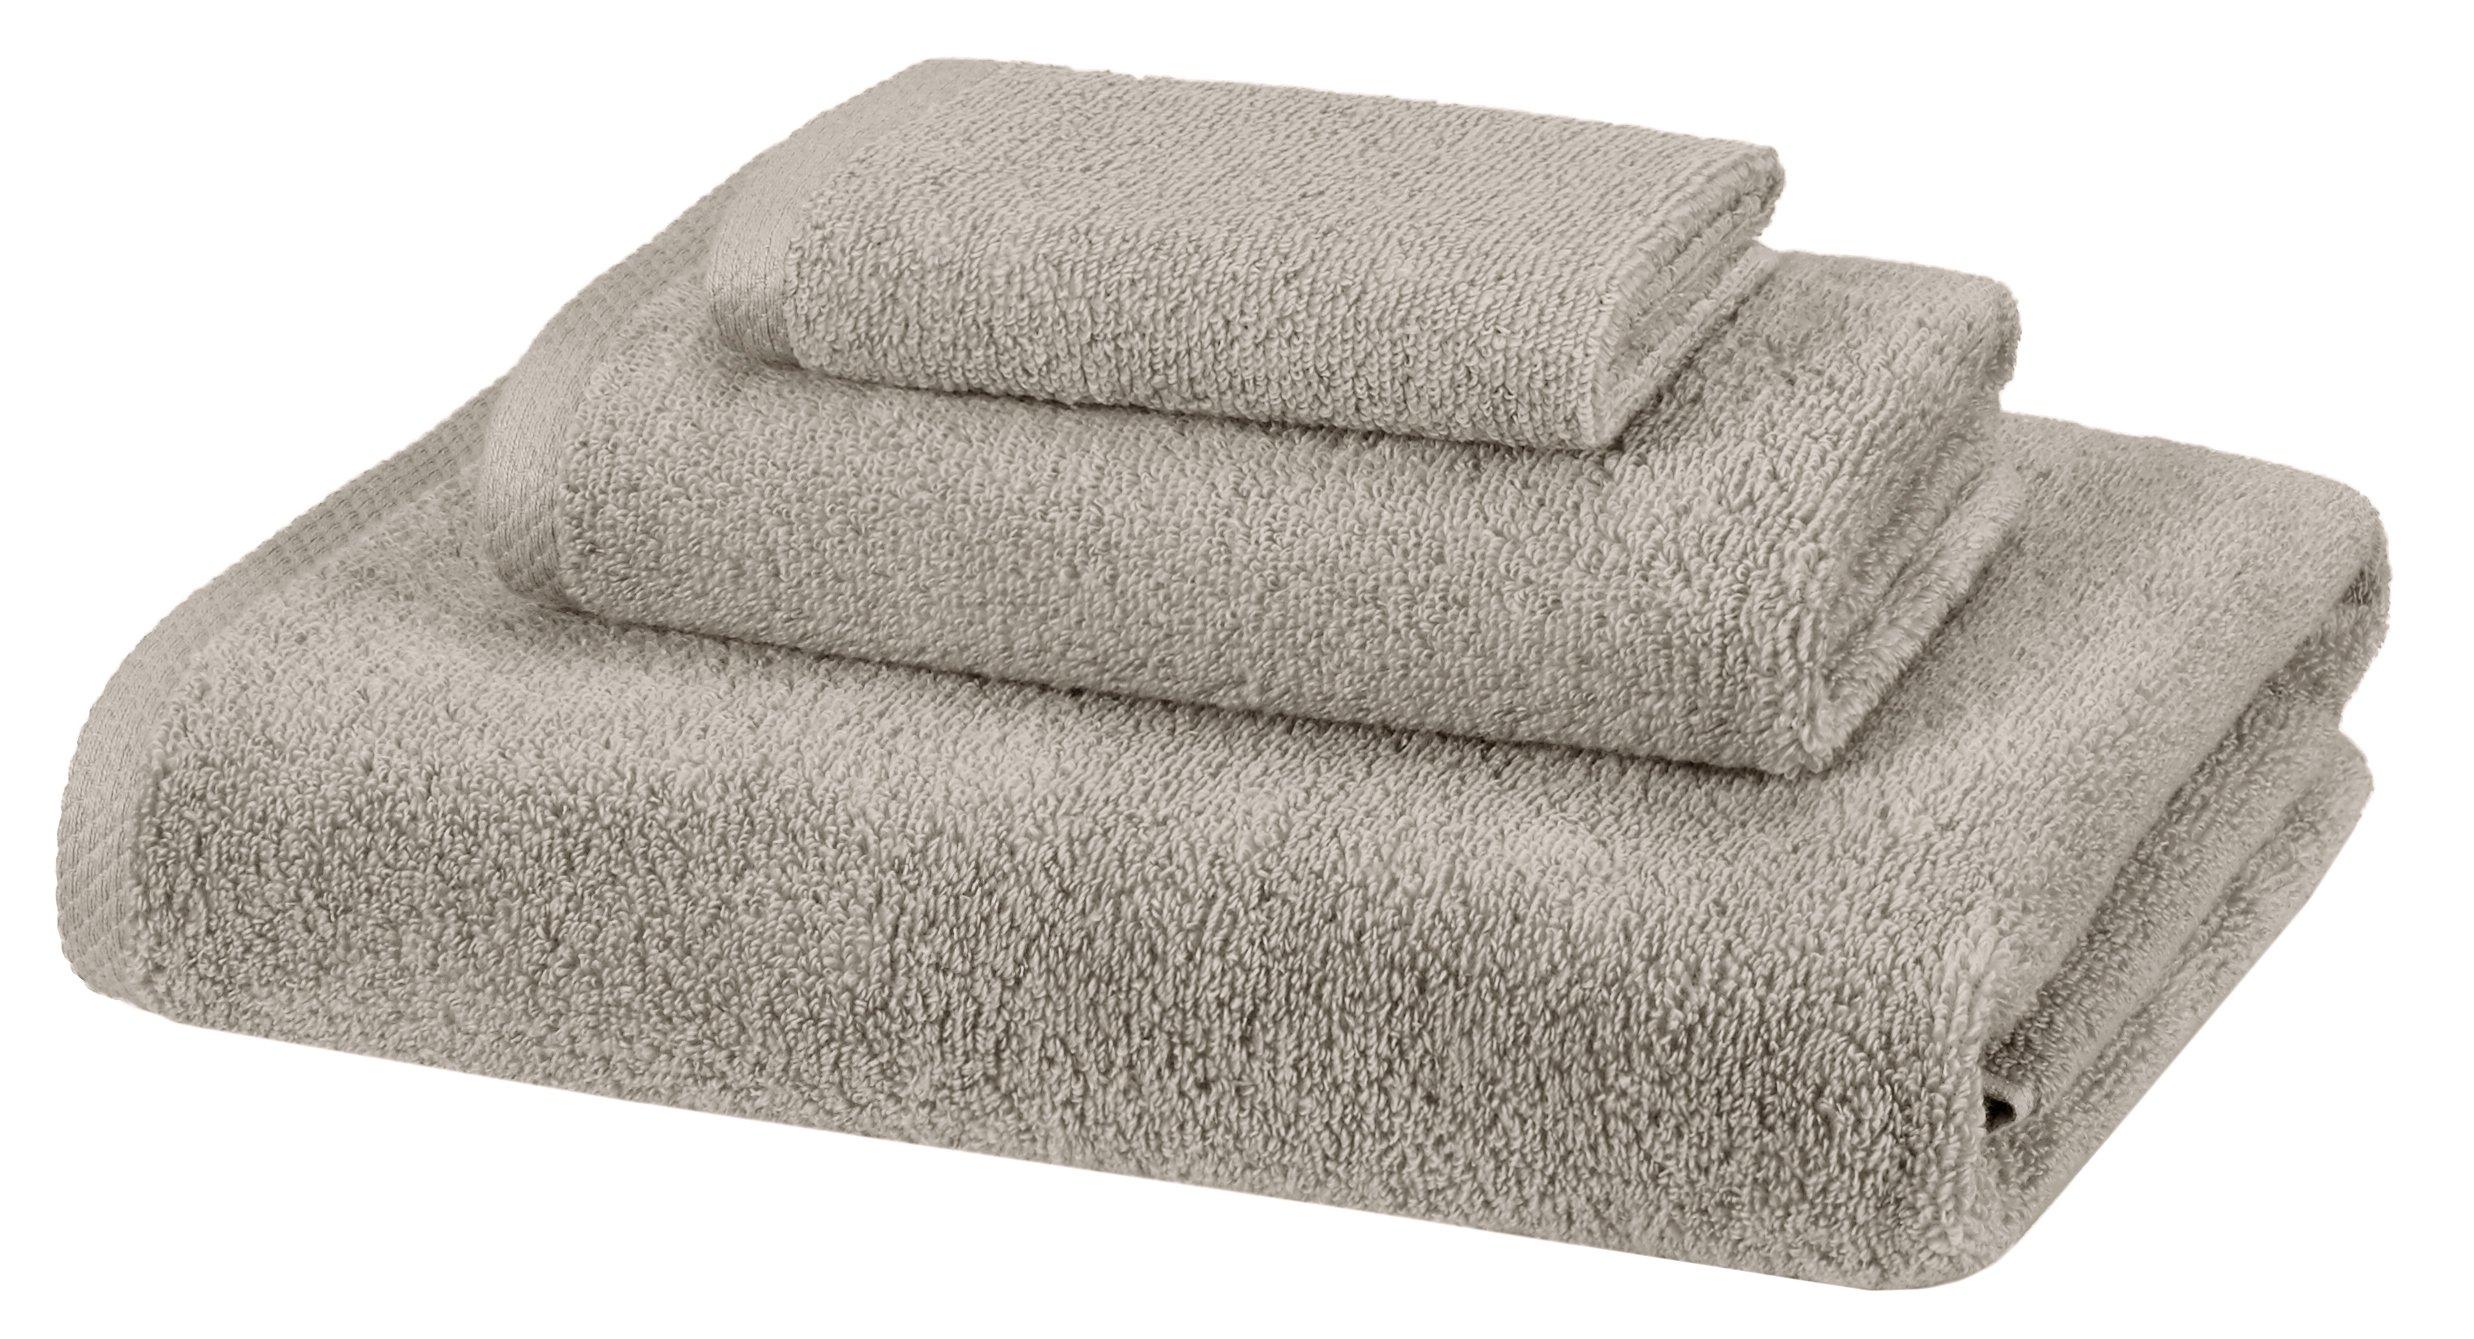 AmazonBasics Quick-Dry Towels - 100% Cotton, 3-Piece Set, Platinum